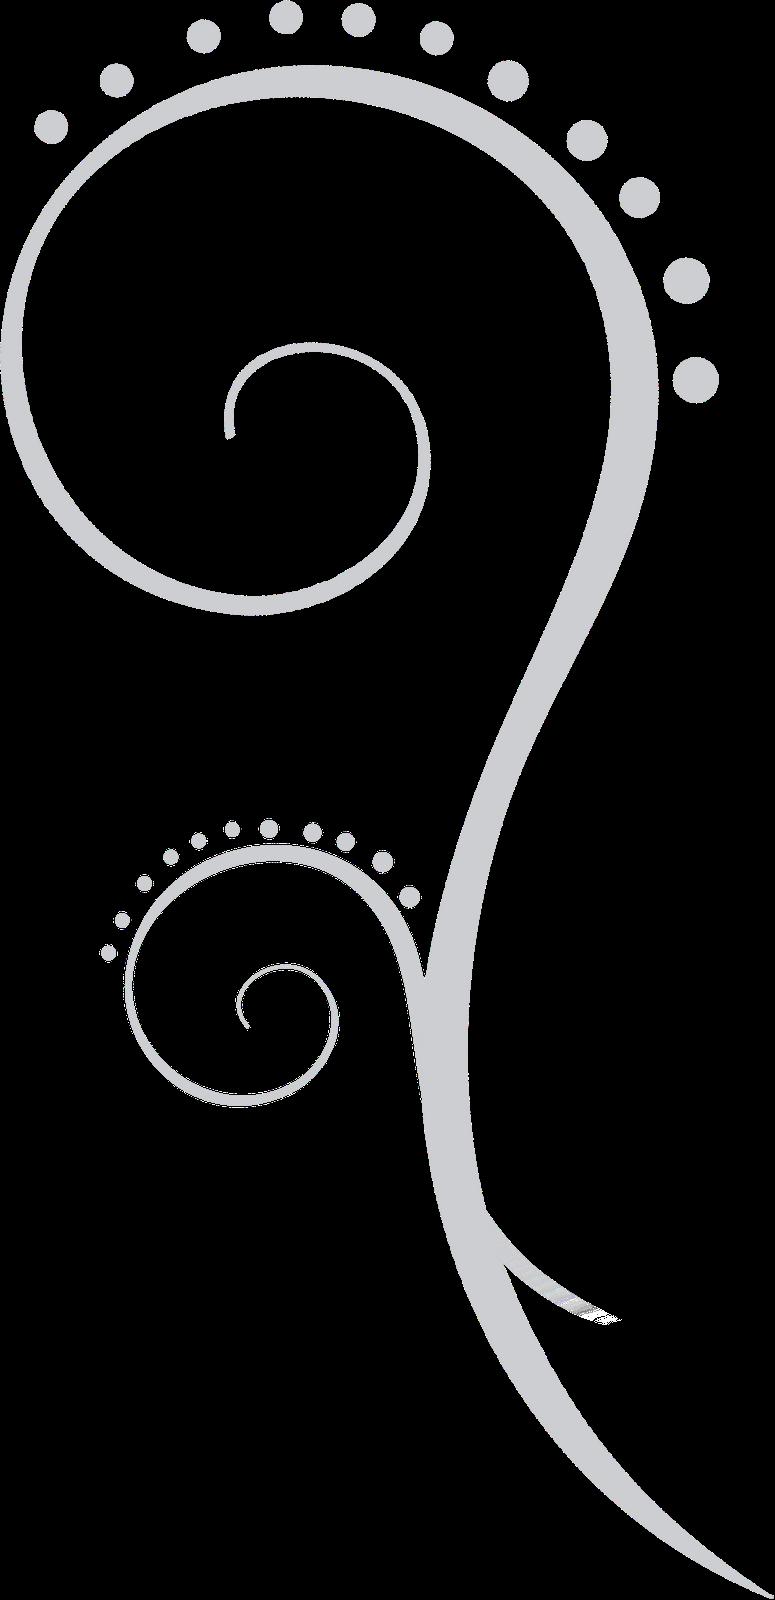 Jennifer Fehr Designs March 2011 Swirly Designs Swirl Design Swirl Tattoo